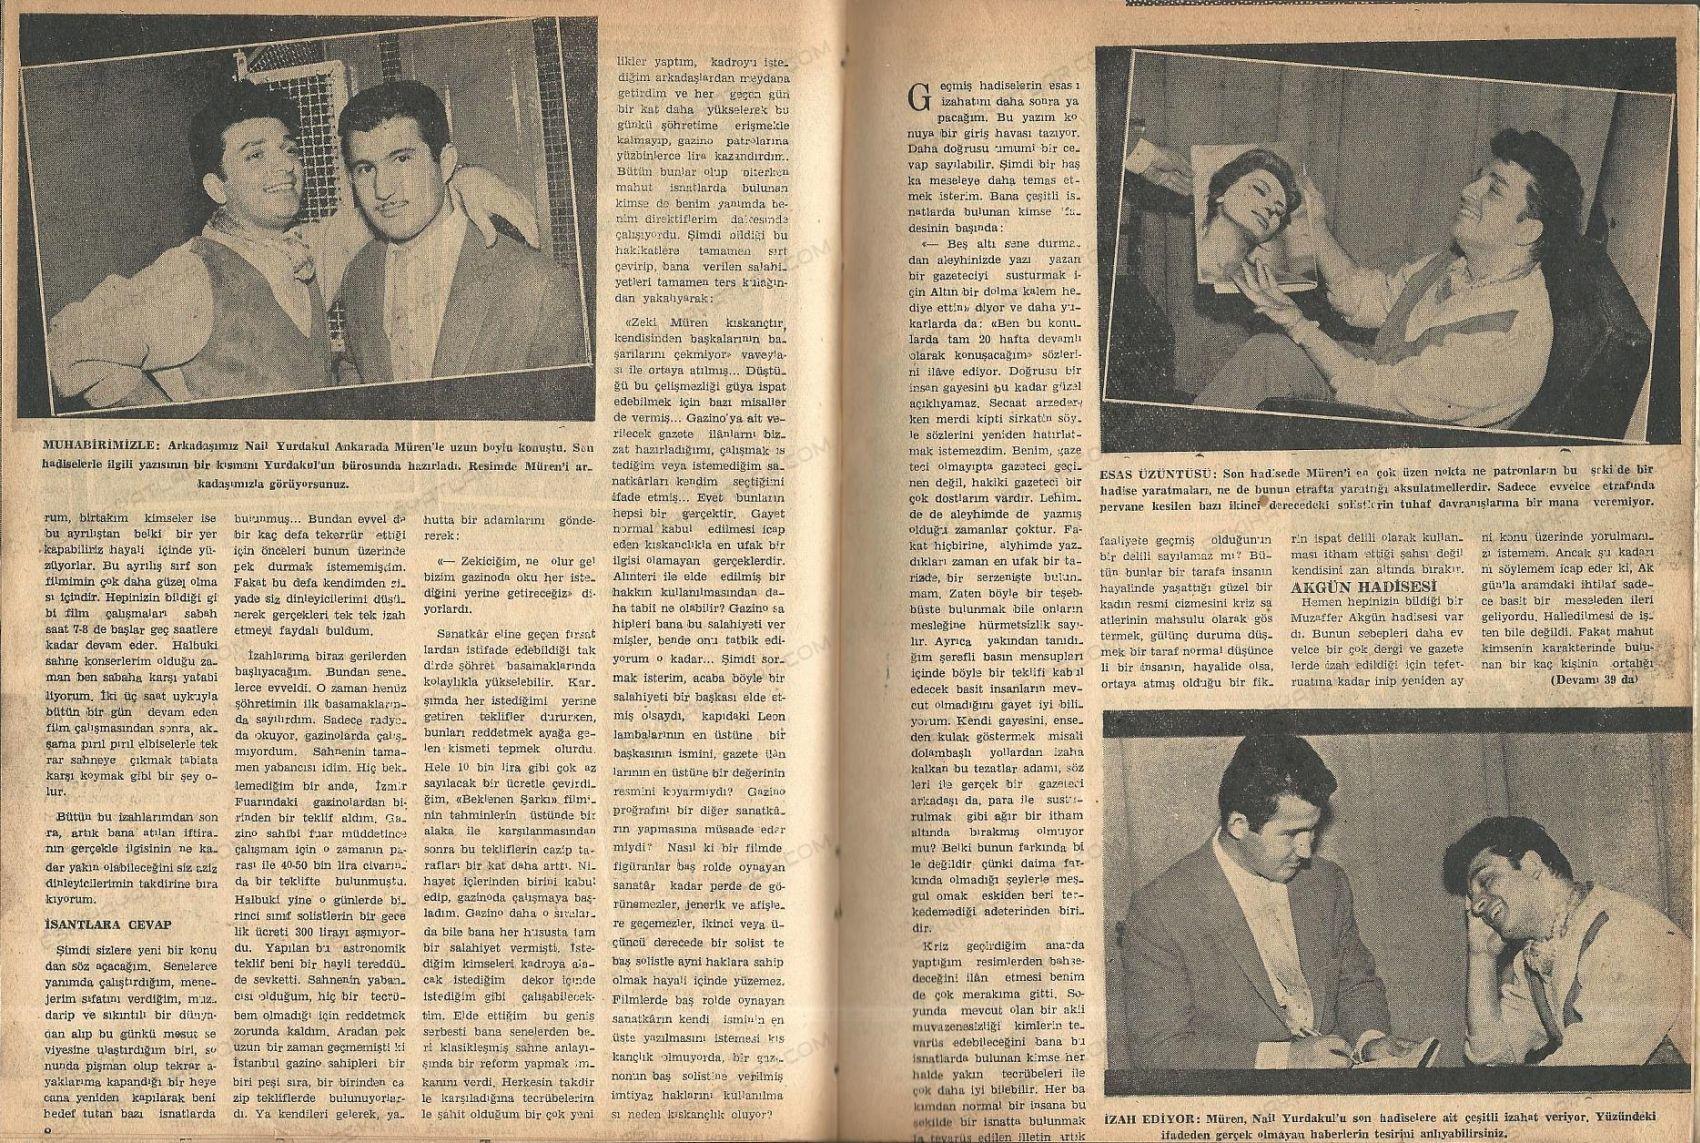 0489-artist-dergisi-1962-arsivi-foto-stil-zeki-muren-haberleri-colpan-ilhan (3)